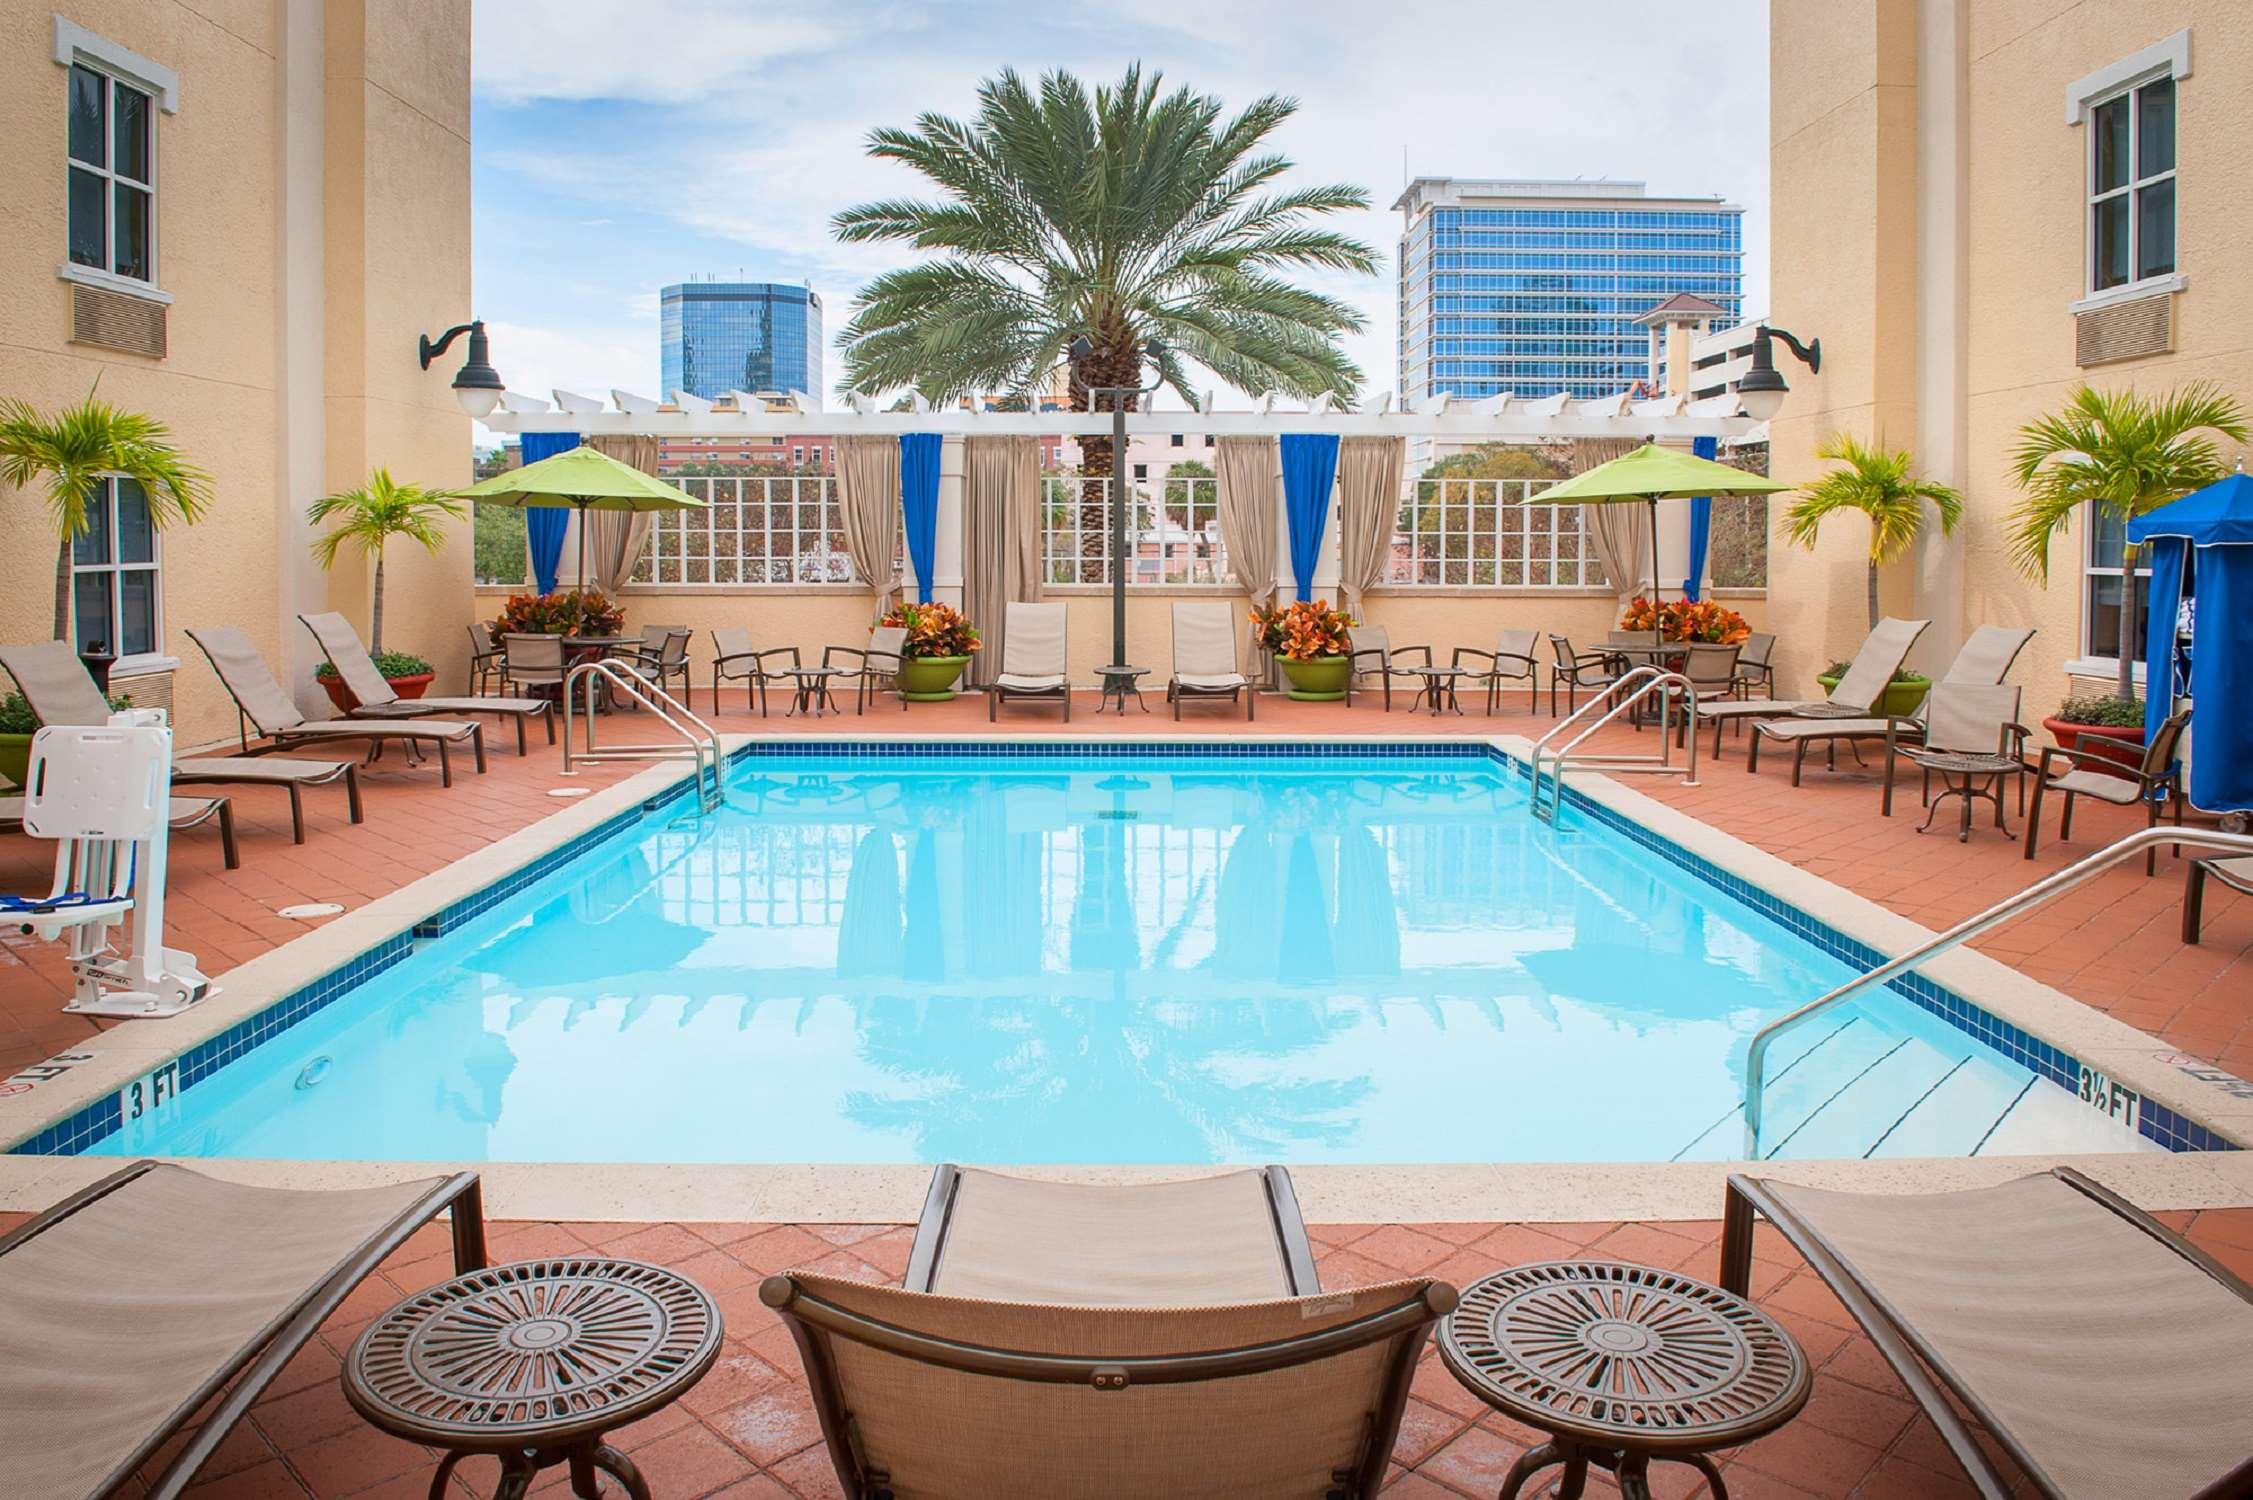 Hampton Inn & Suites St. Petersburg/Downtown image 5